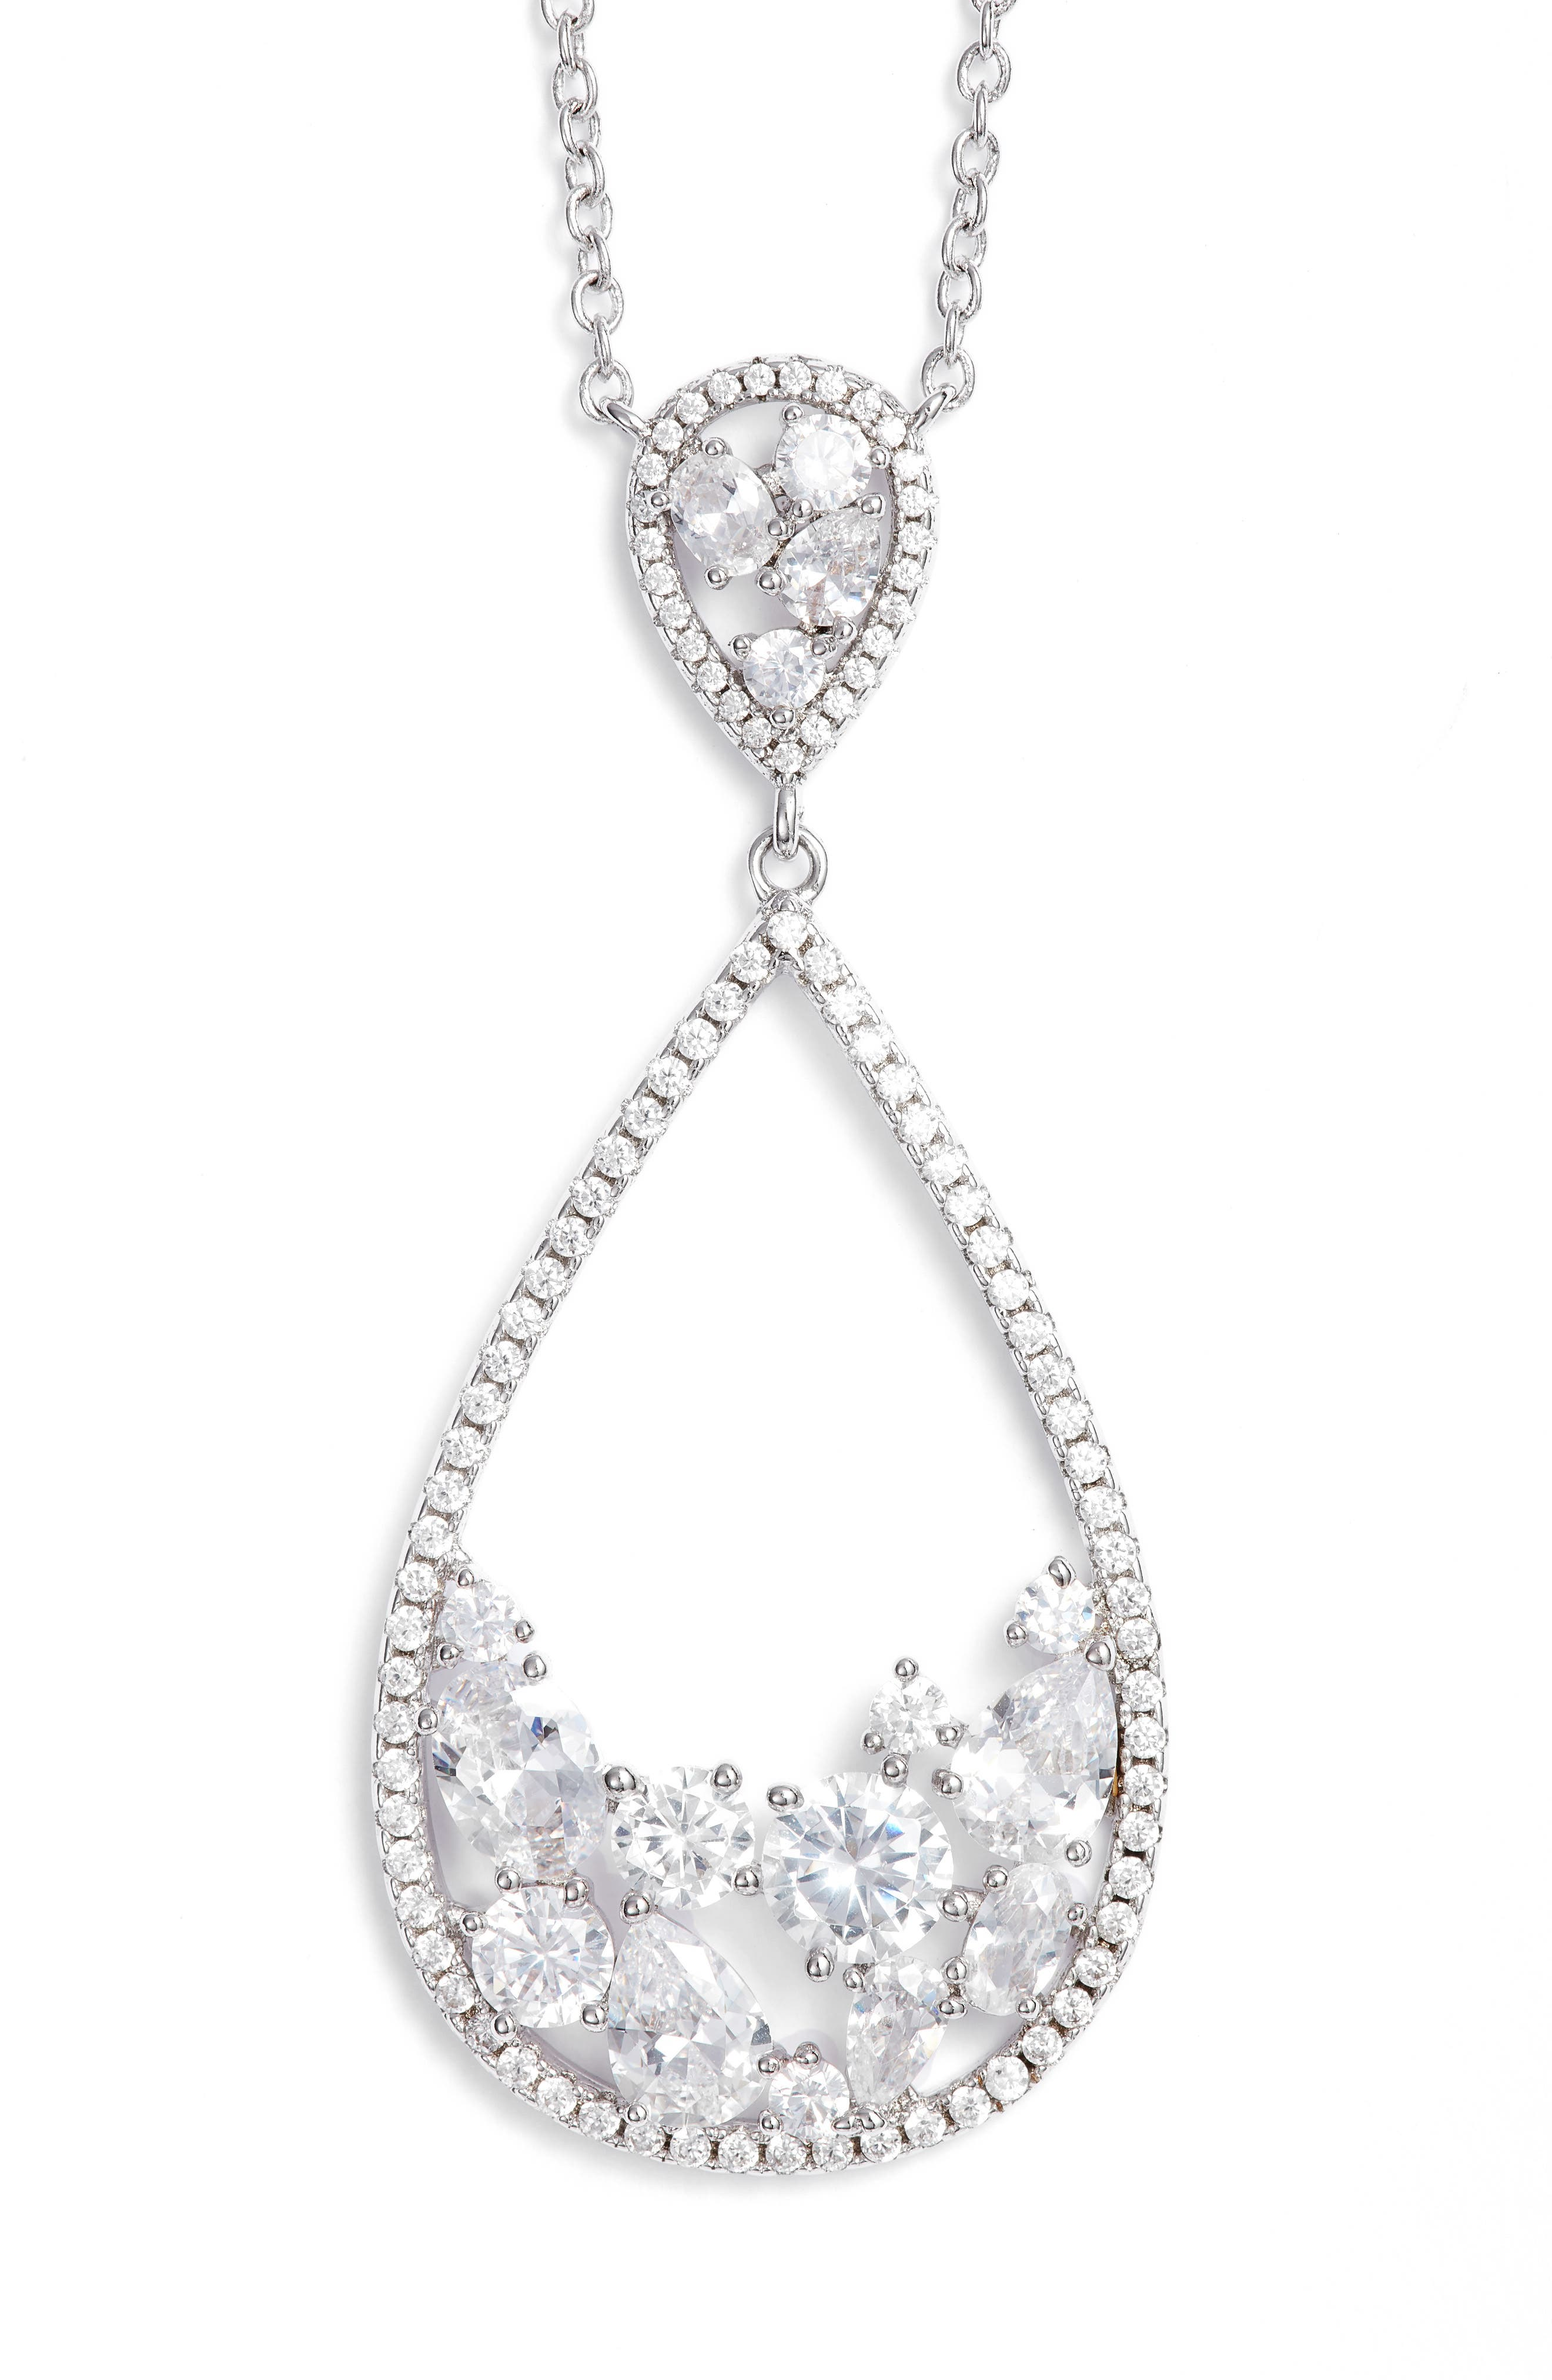 Stone Cluster Open Teardrop Pendant Necklace,                         Main,                         color, Silver/ White Cz